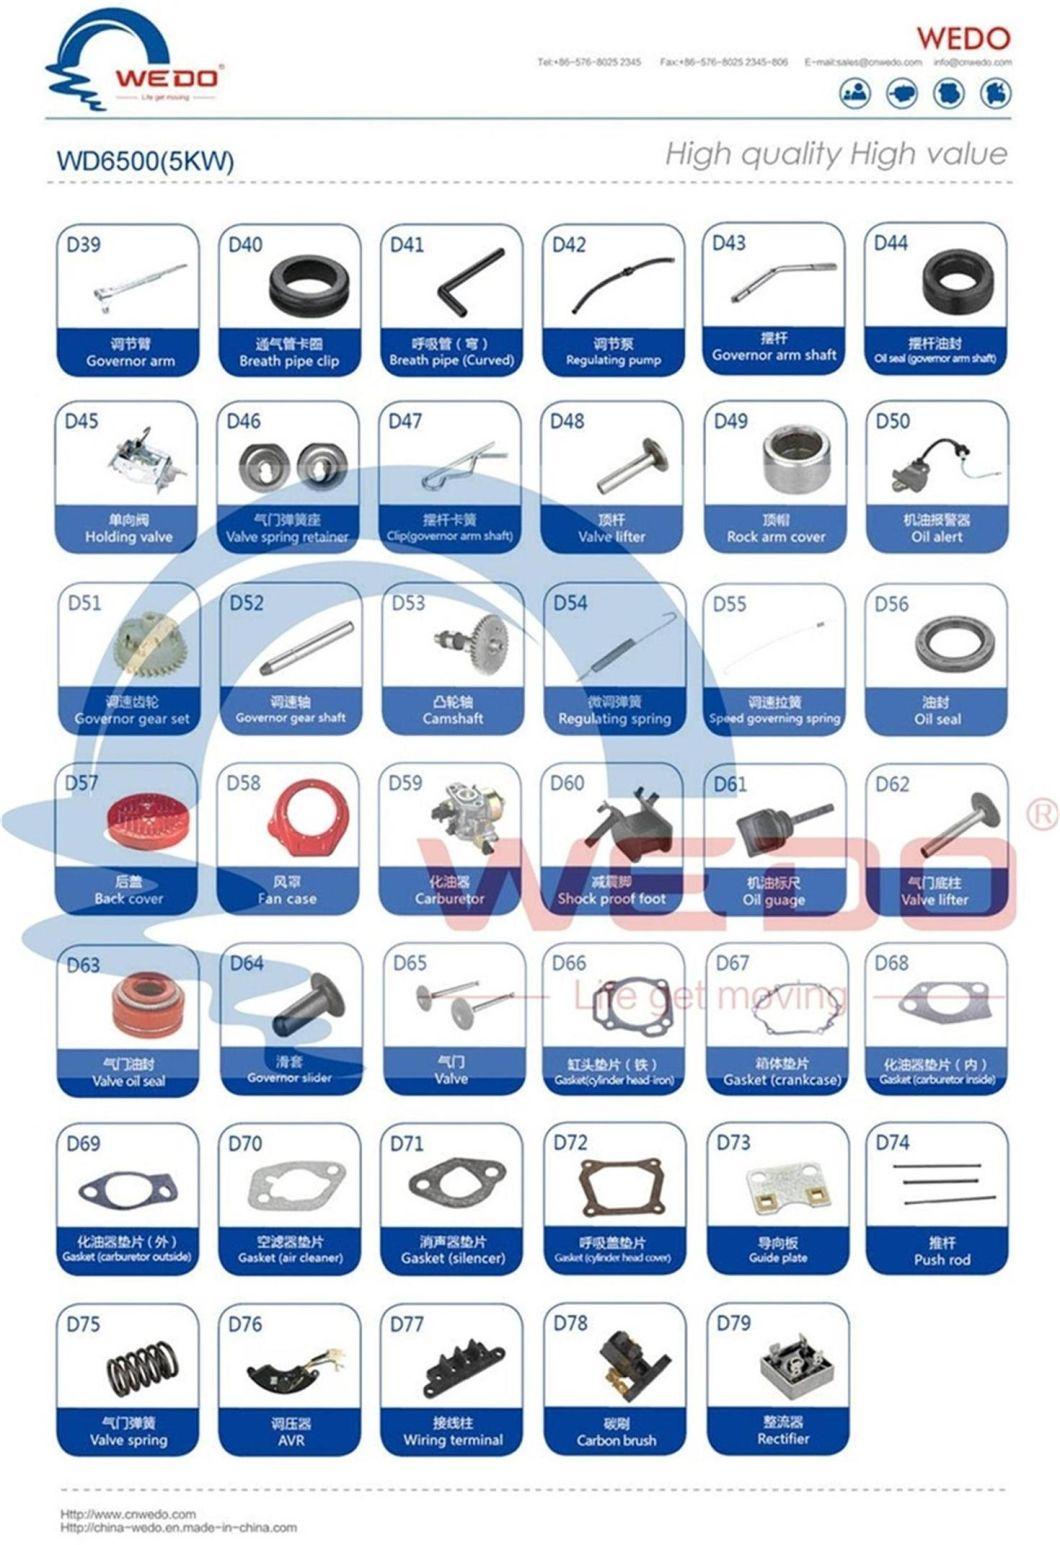 3kw/4kw/5kw Carburetor/Crankshaft/Piston/Spark Plug/Recoil Starter Gasoline Generators Spare Parts